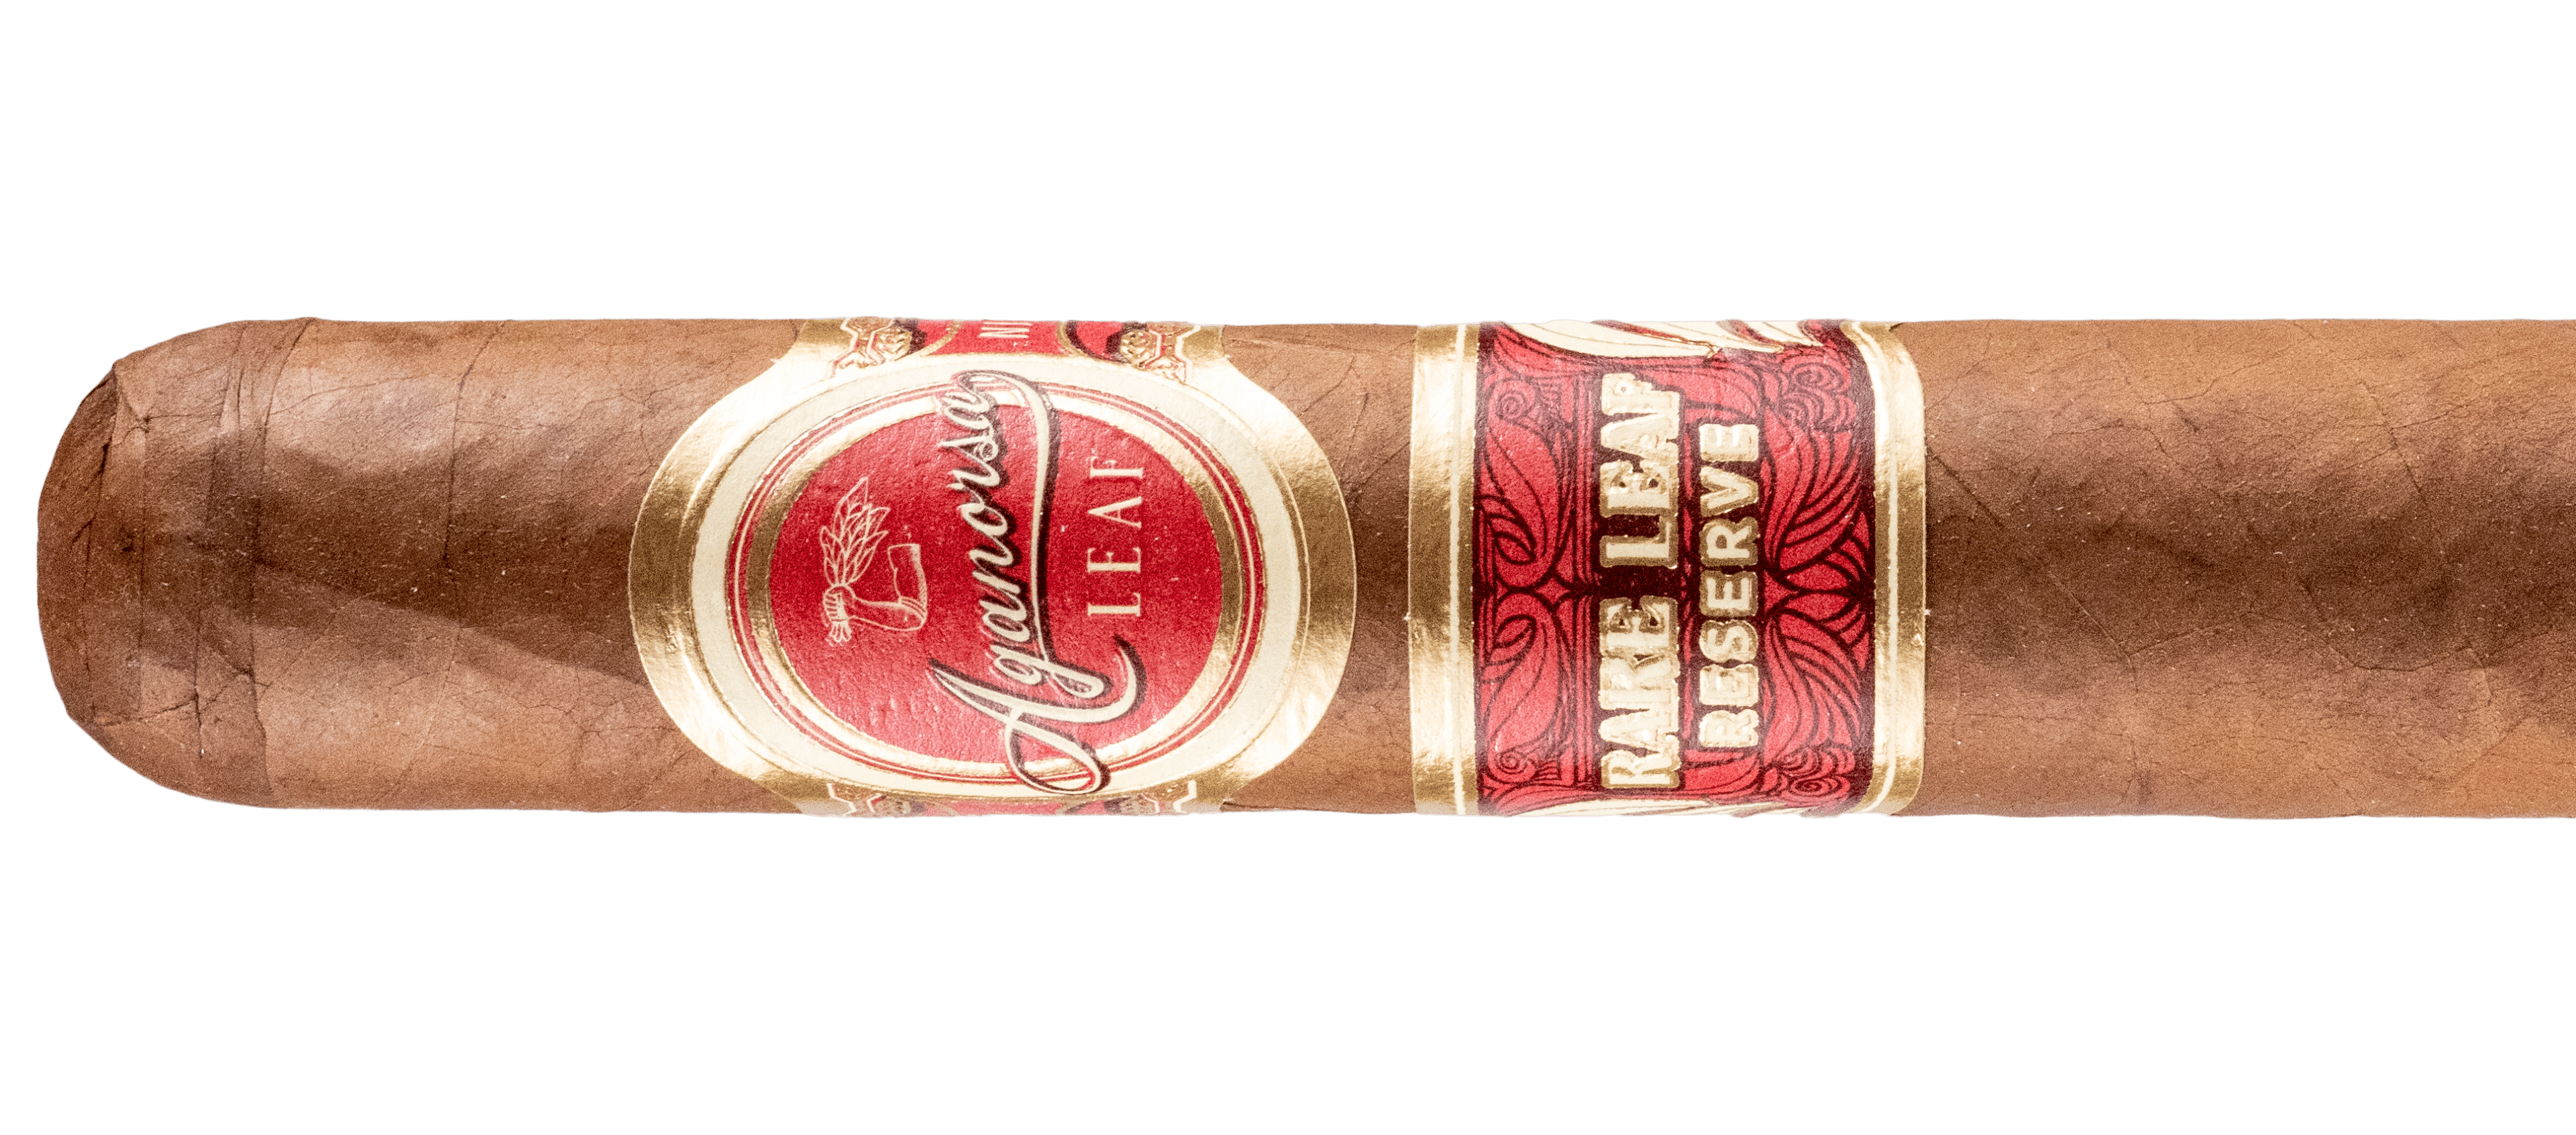 Aganorsa Leaf Rare Leaf Reserve Toro - Blind Cigar Review